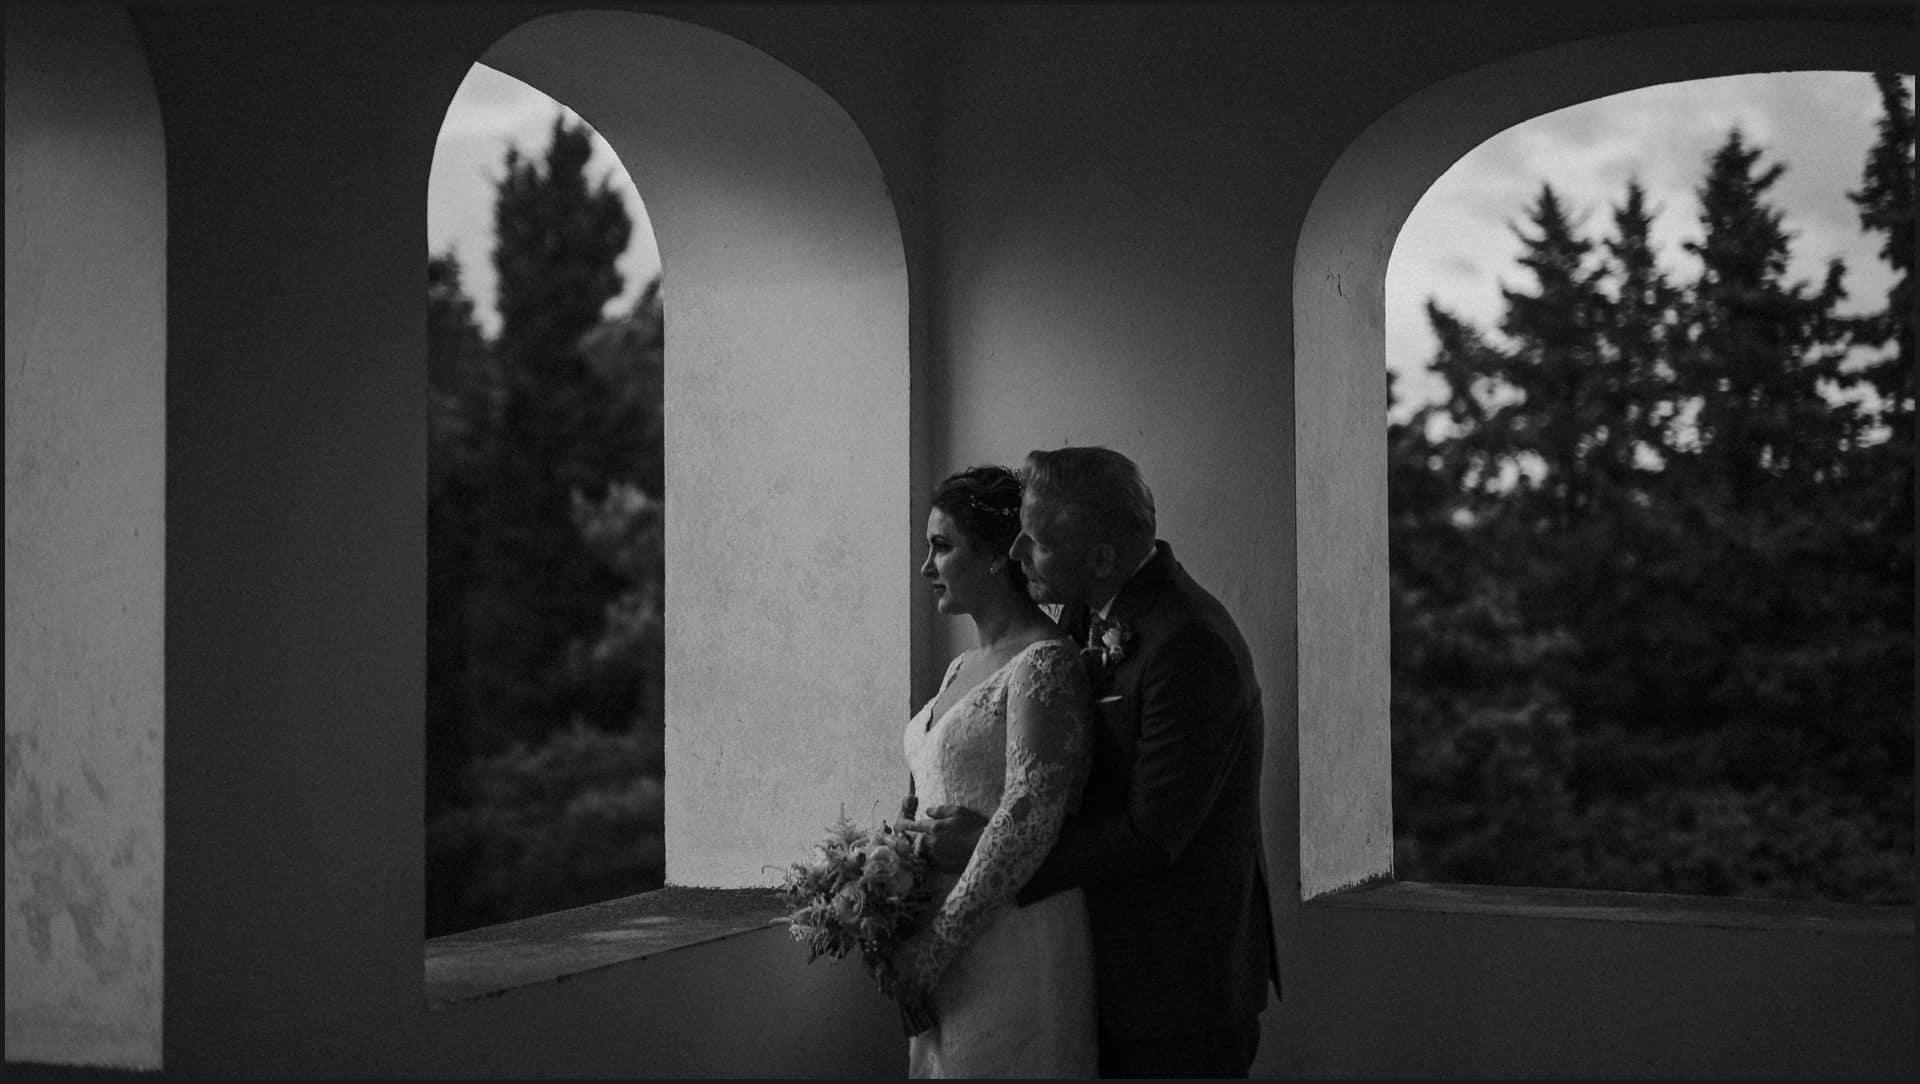 tuscany, destination wedding, chianti, bride, groom, black and white, intimate, couple portrait